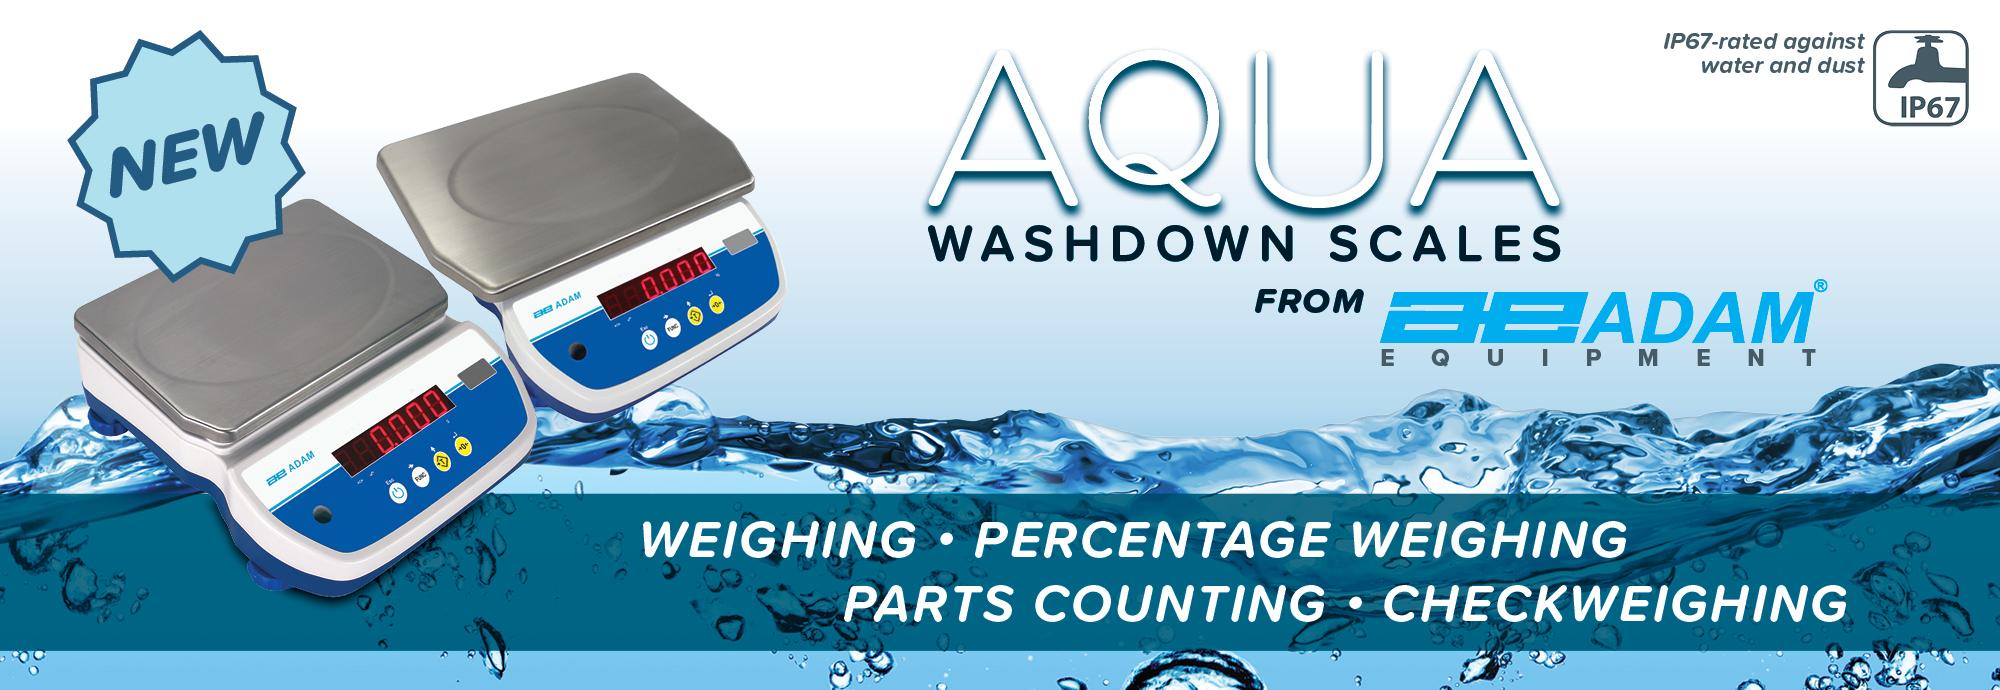 Wash Down Bench Scale Aqua from Adam Equipment